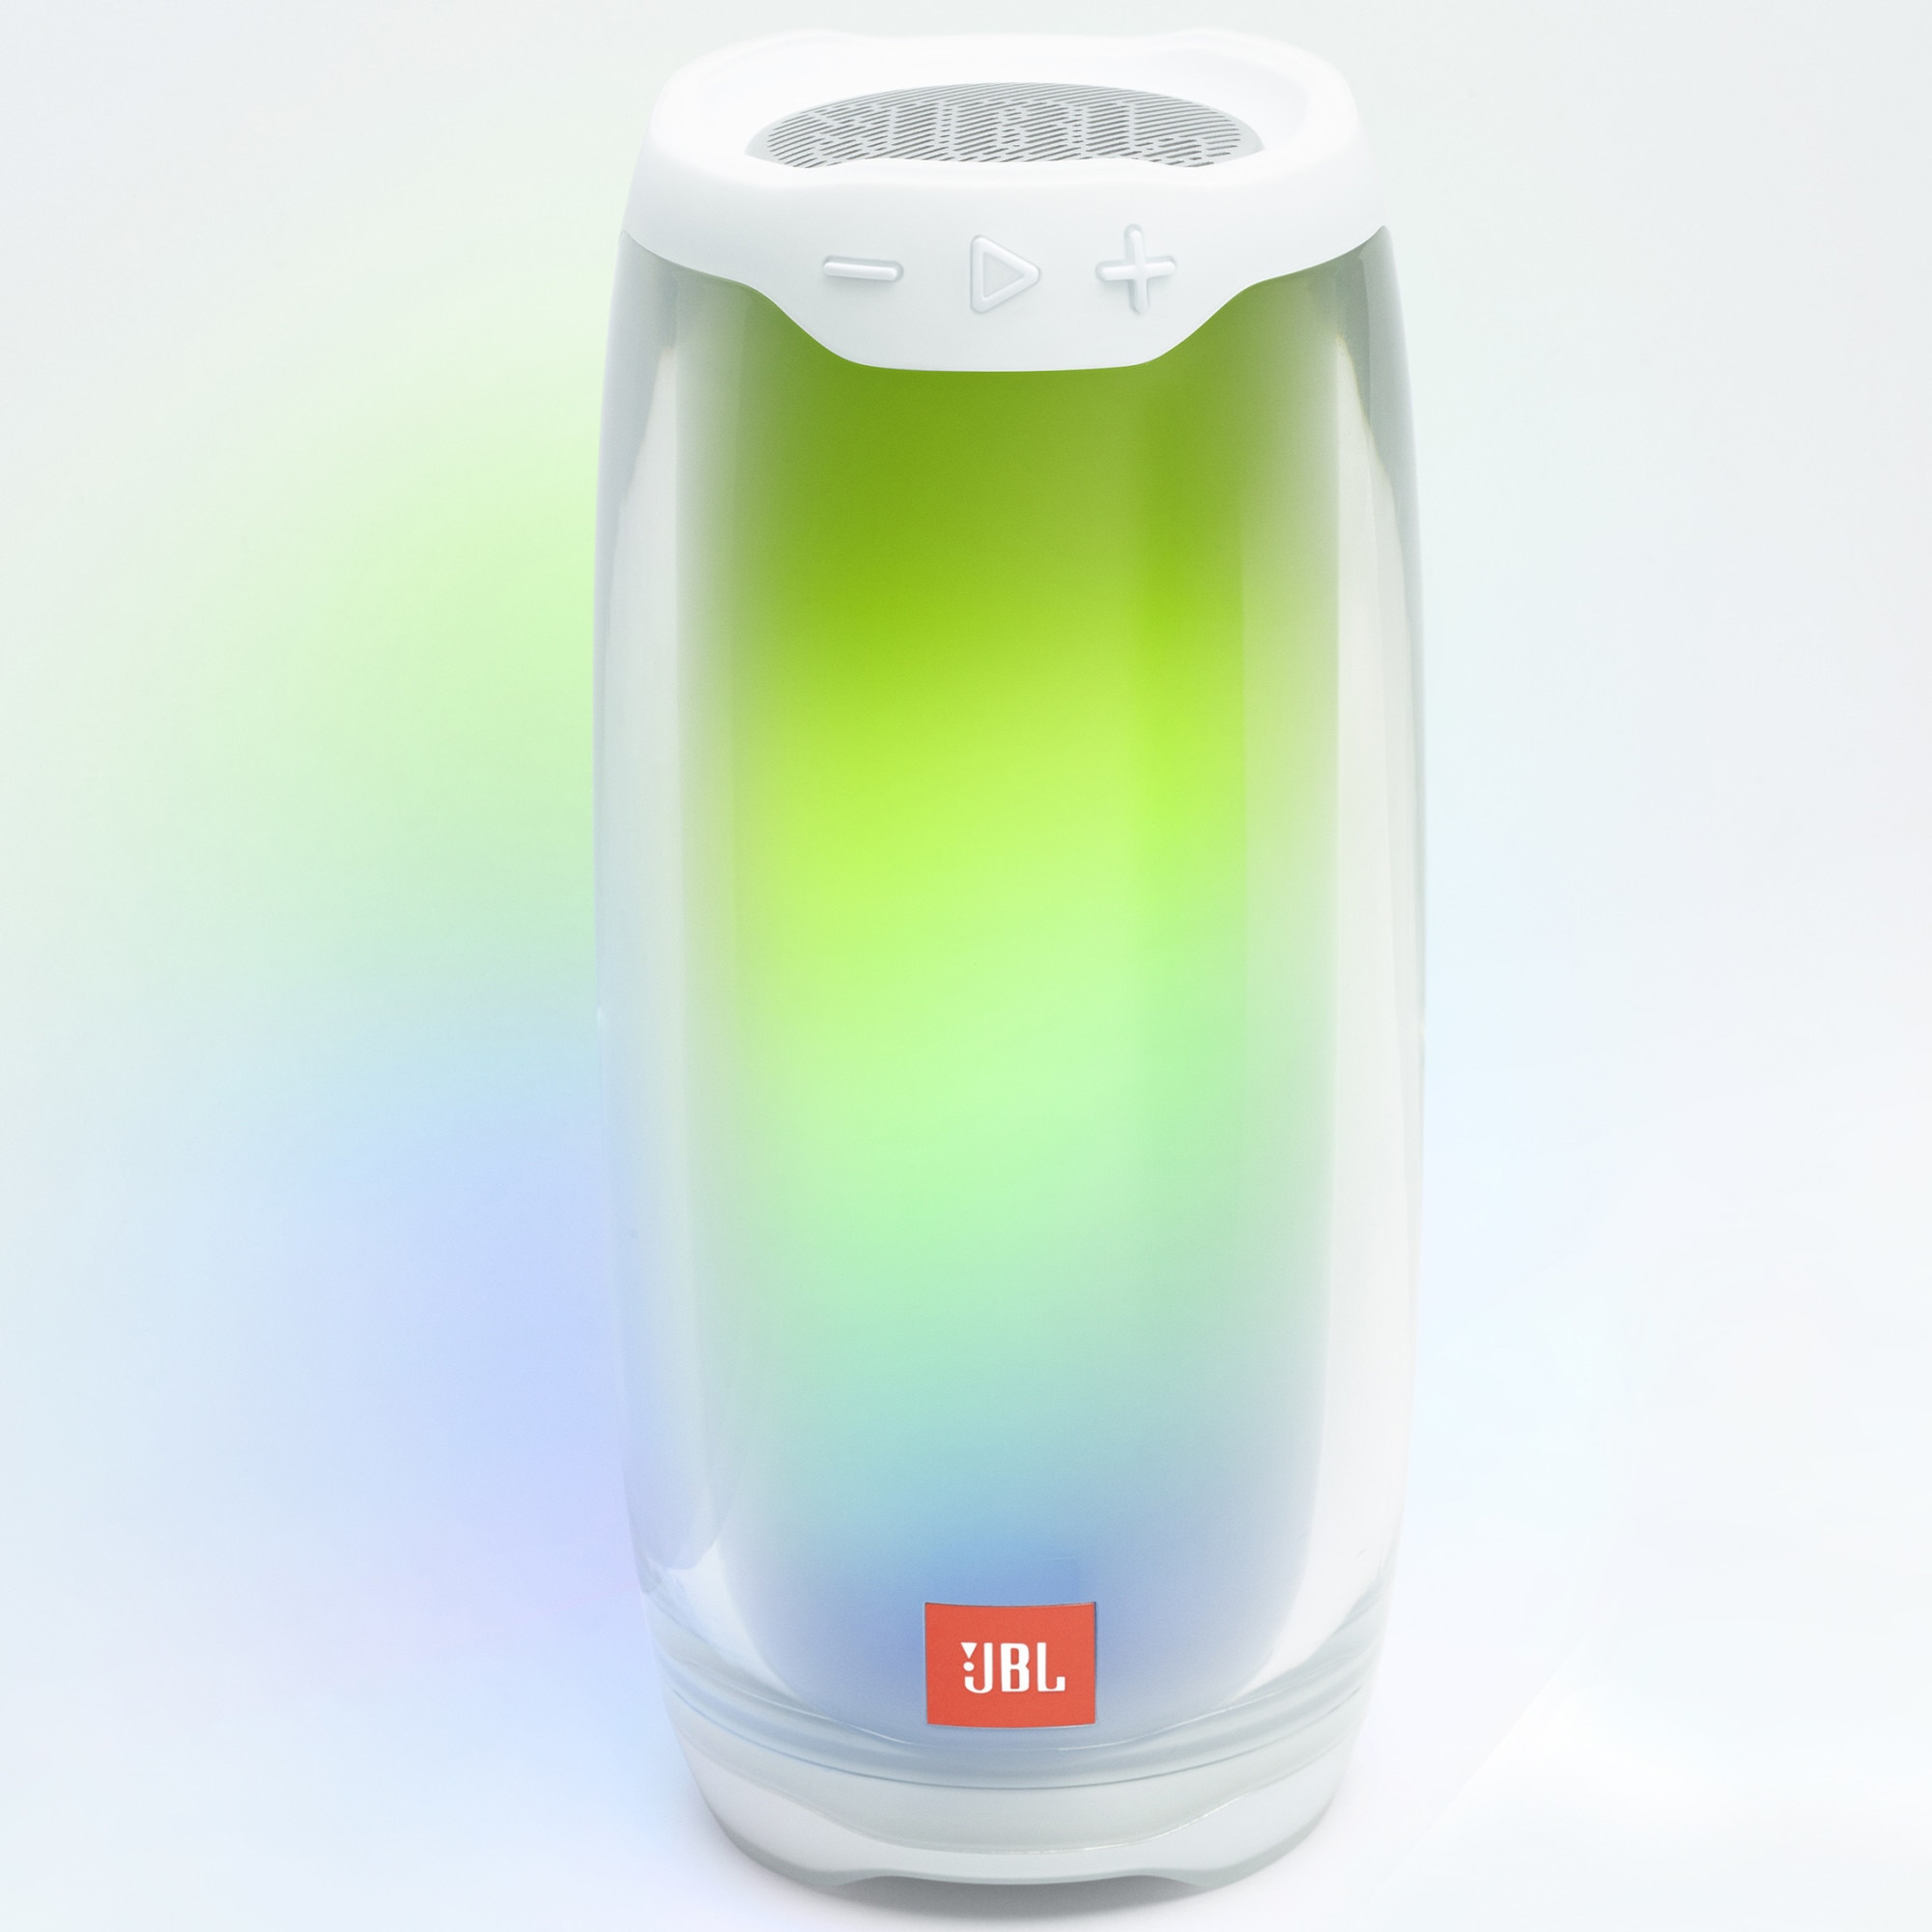 Fotografie Boxa portabila JBL PULSE 4, Bluetooth, 360 LED Lightshow & Speaker, PartyBoost, USB C, 12H Playtime, Rezistenta la apa IPX7, Alb